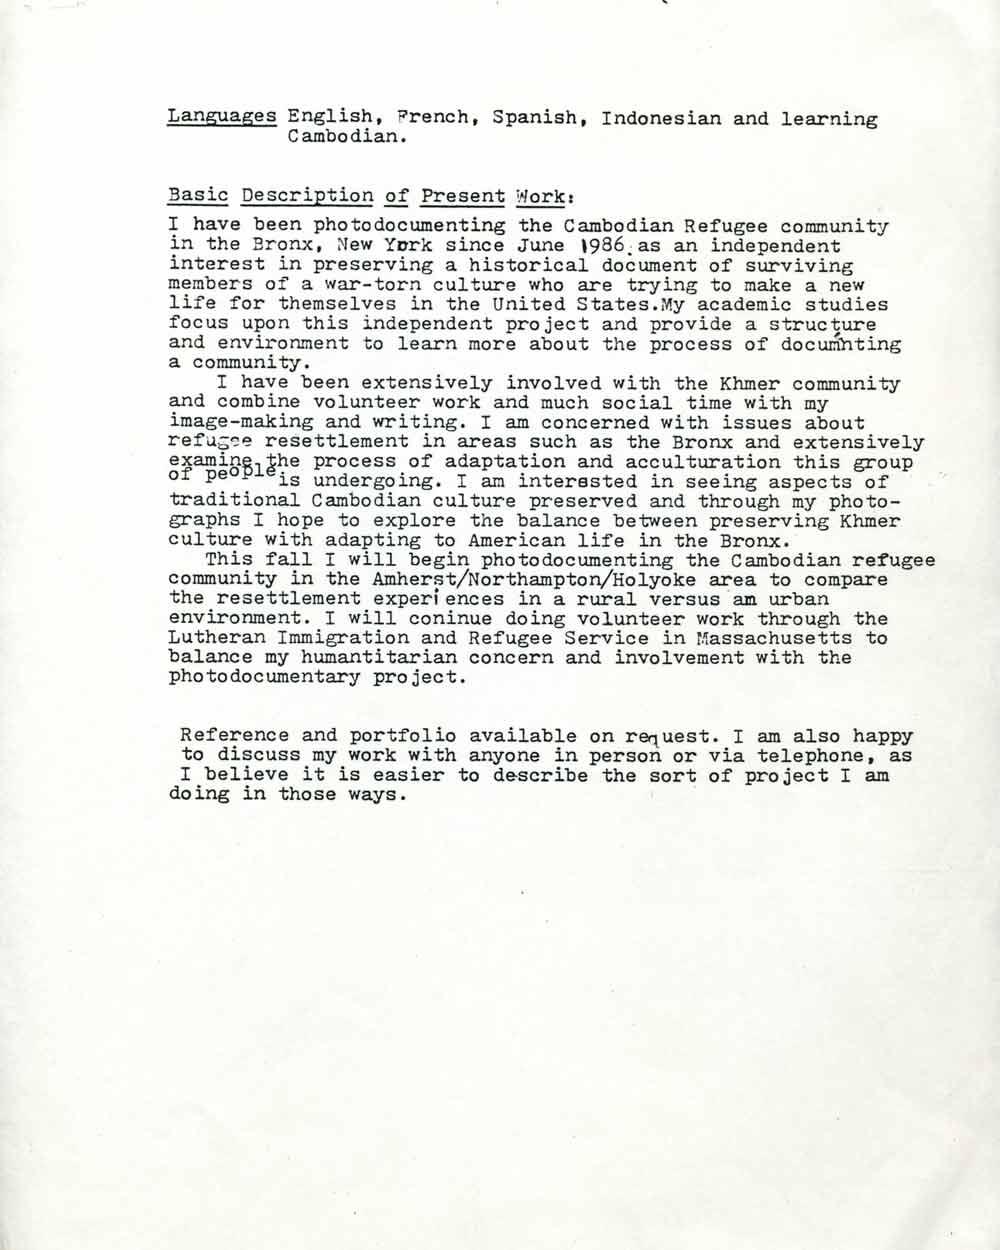 Leah Melnick's Resume, pg 2